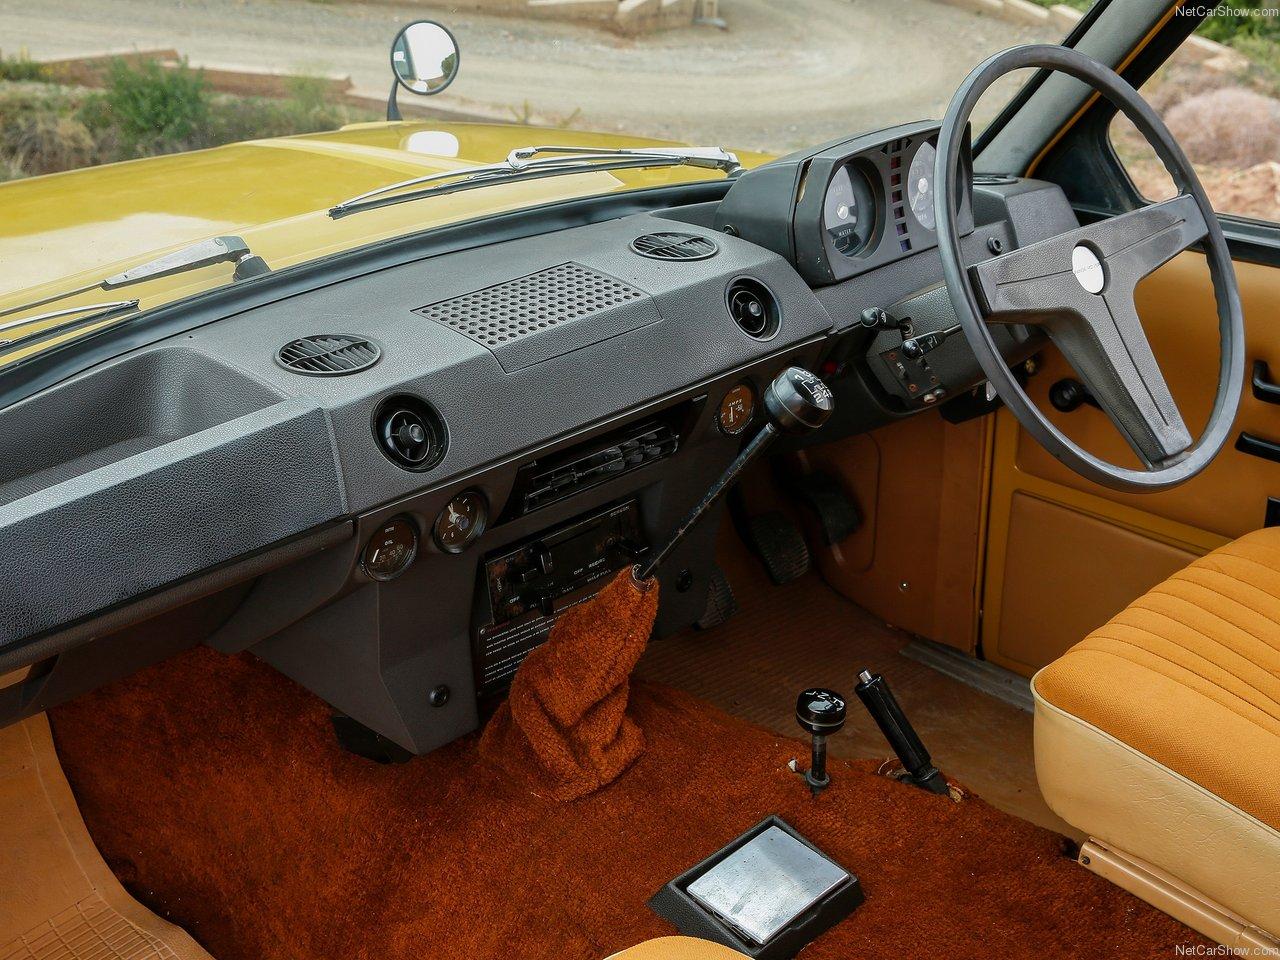 Range Rover, Series 1 Range Rover, 4x4, Range Rover buying guide, Range Rover interior